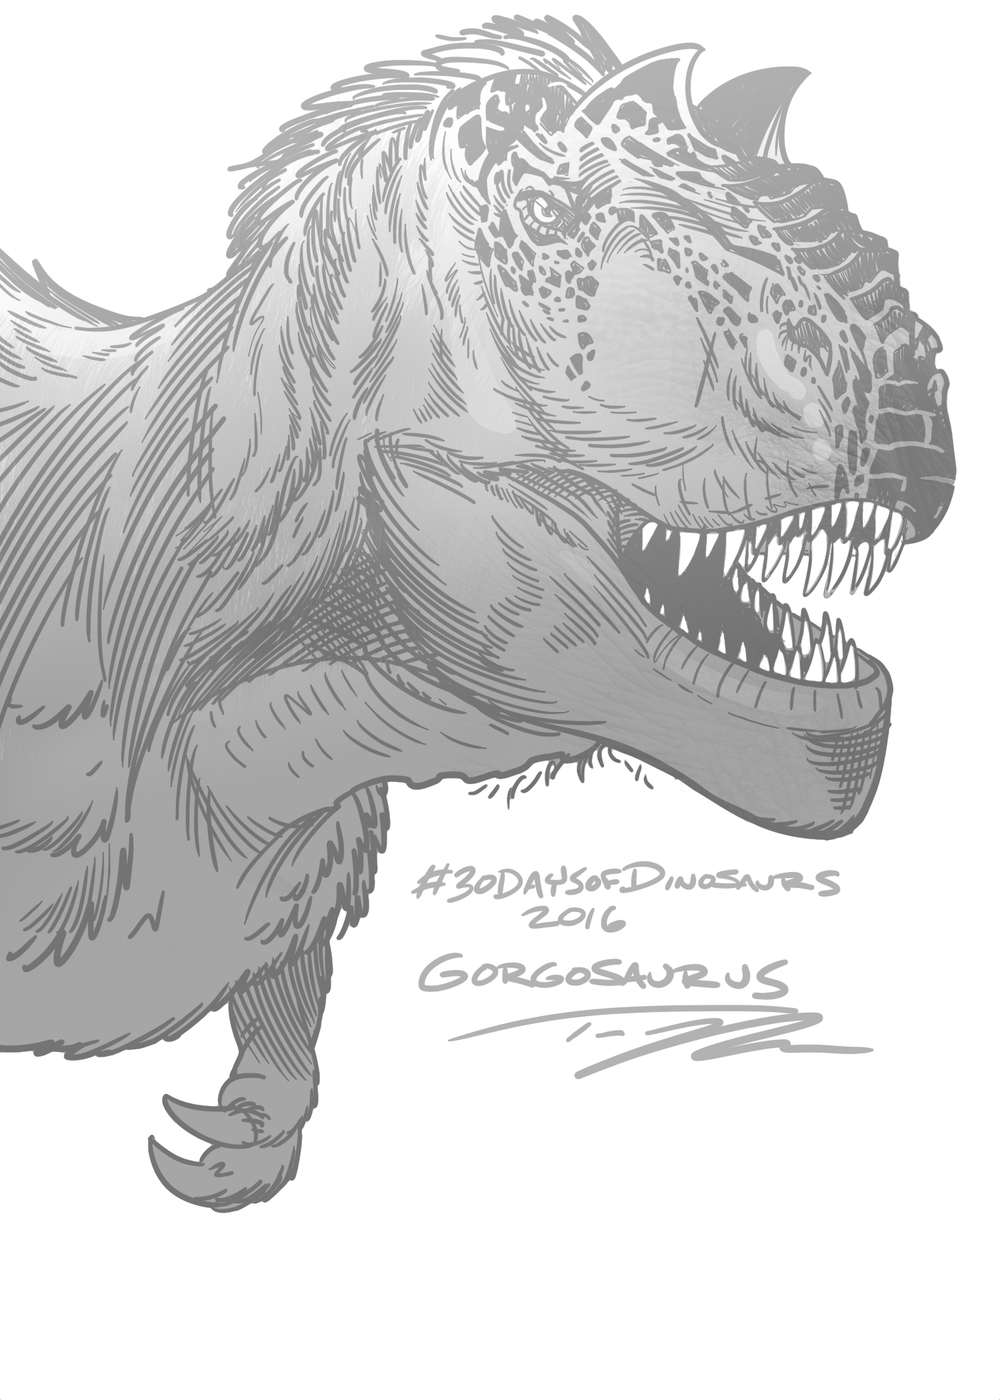 GorgosaurusTedRechlin